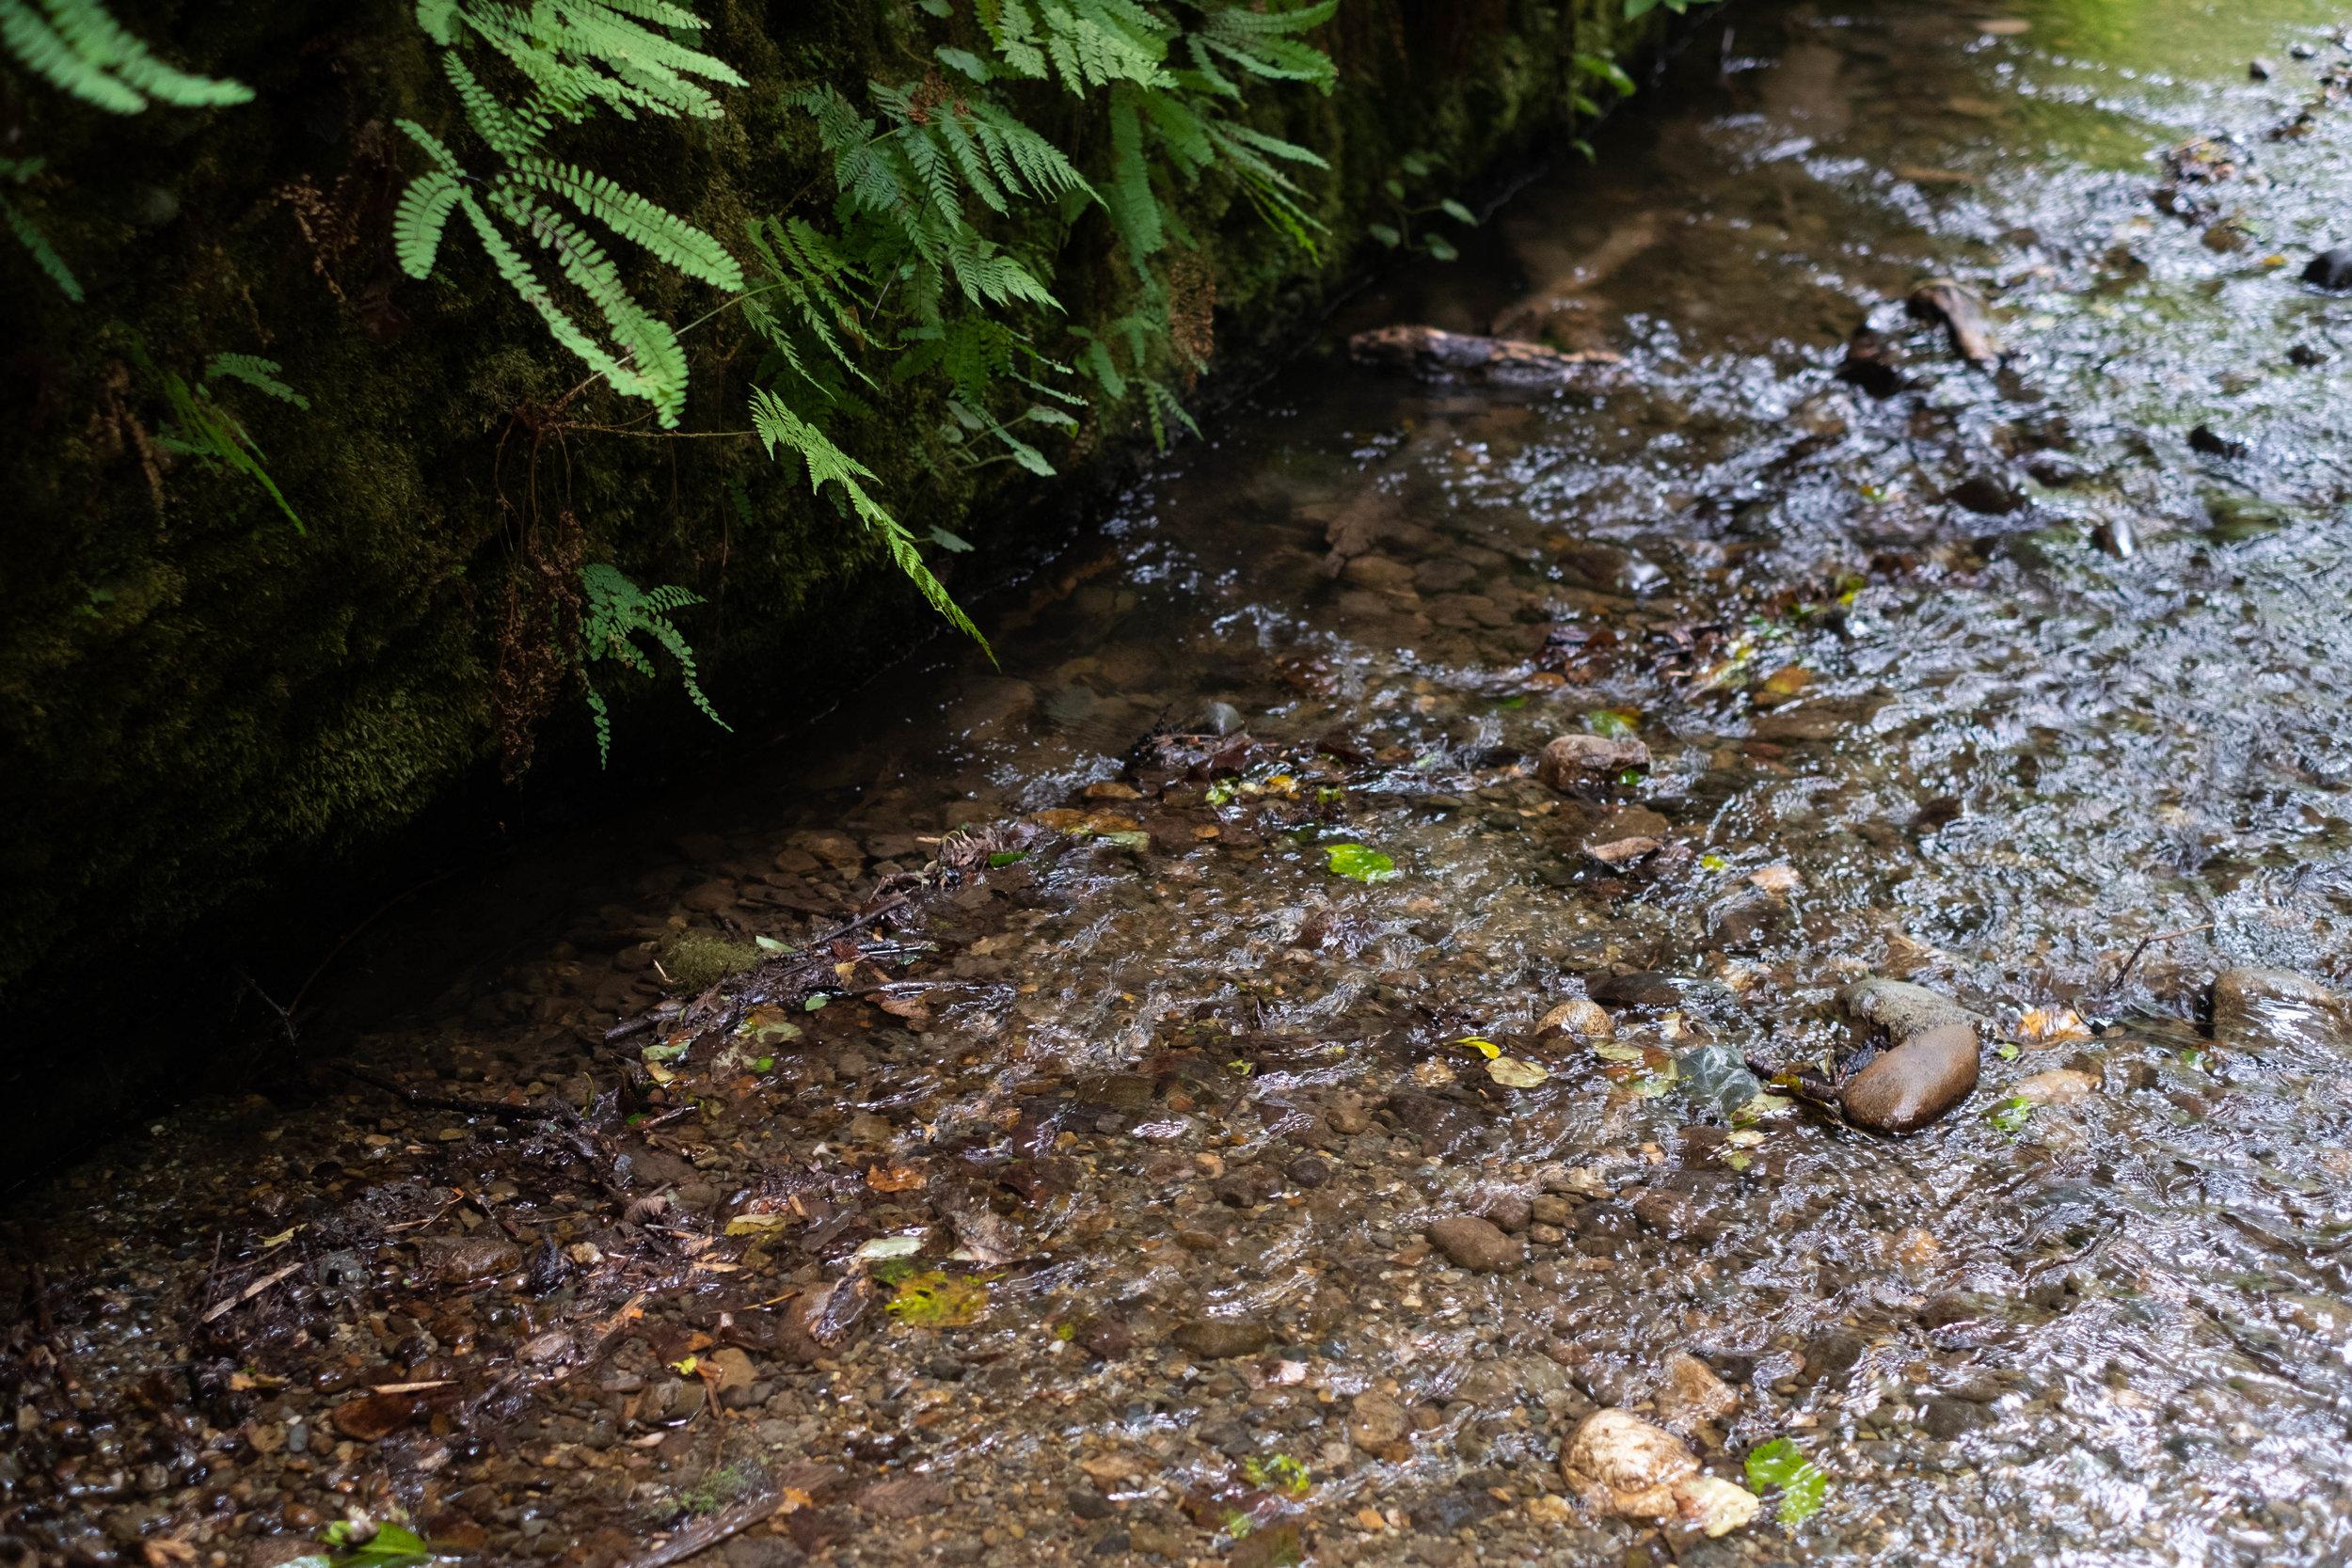 PARIRIE CREEK Redwoods State Park | Jakee zaccor | jzaccor designs